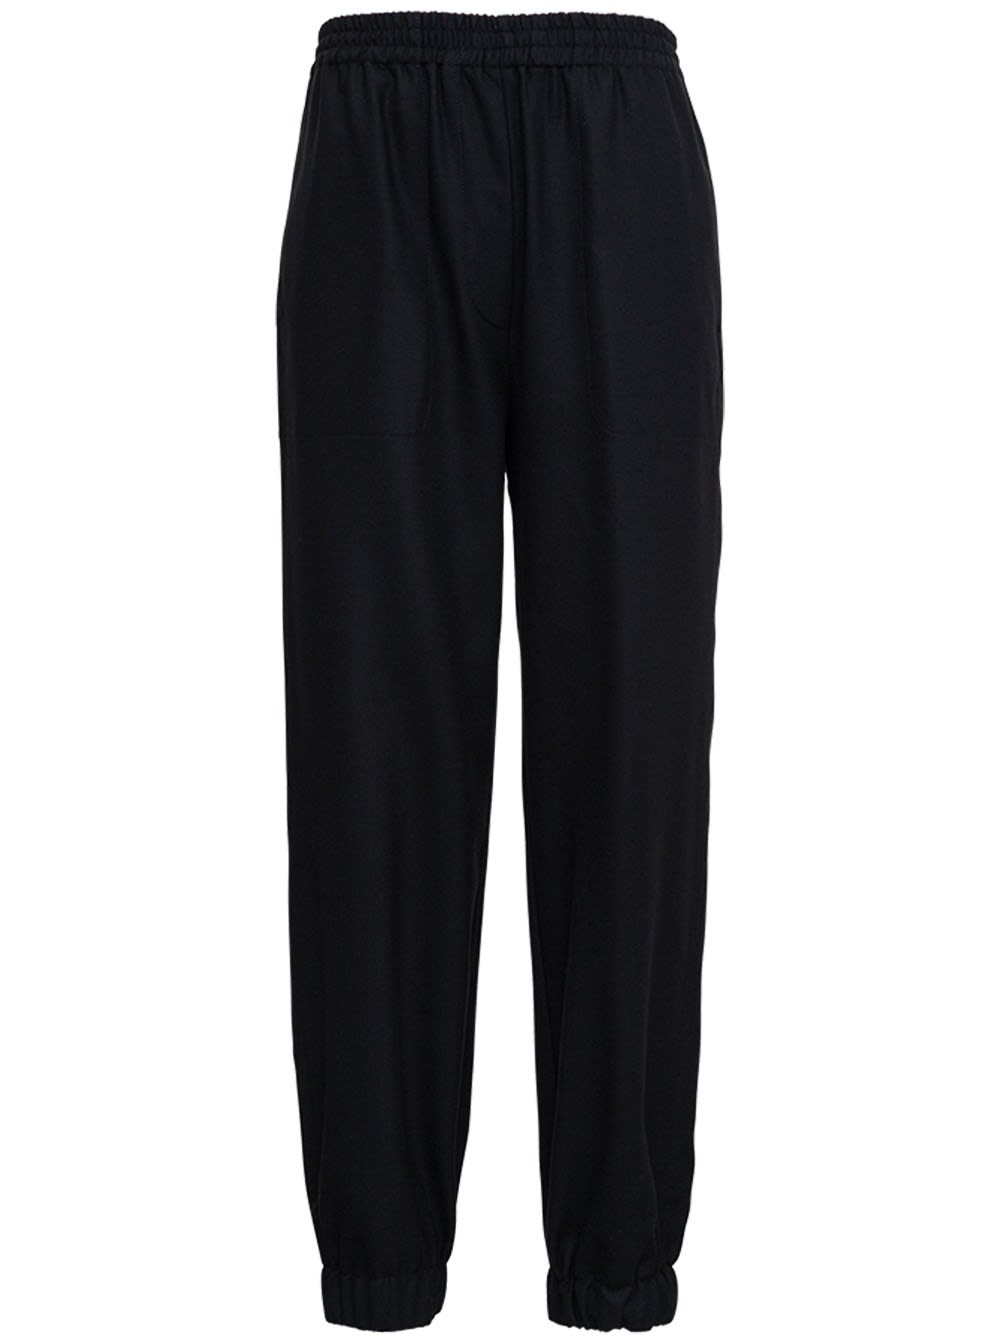 Jucca Black Stretch Wool Pants